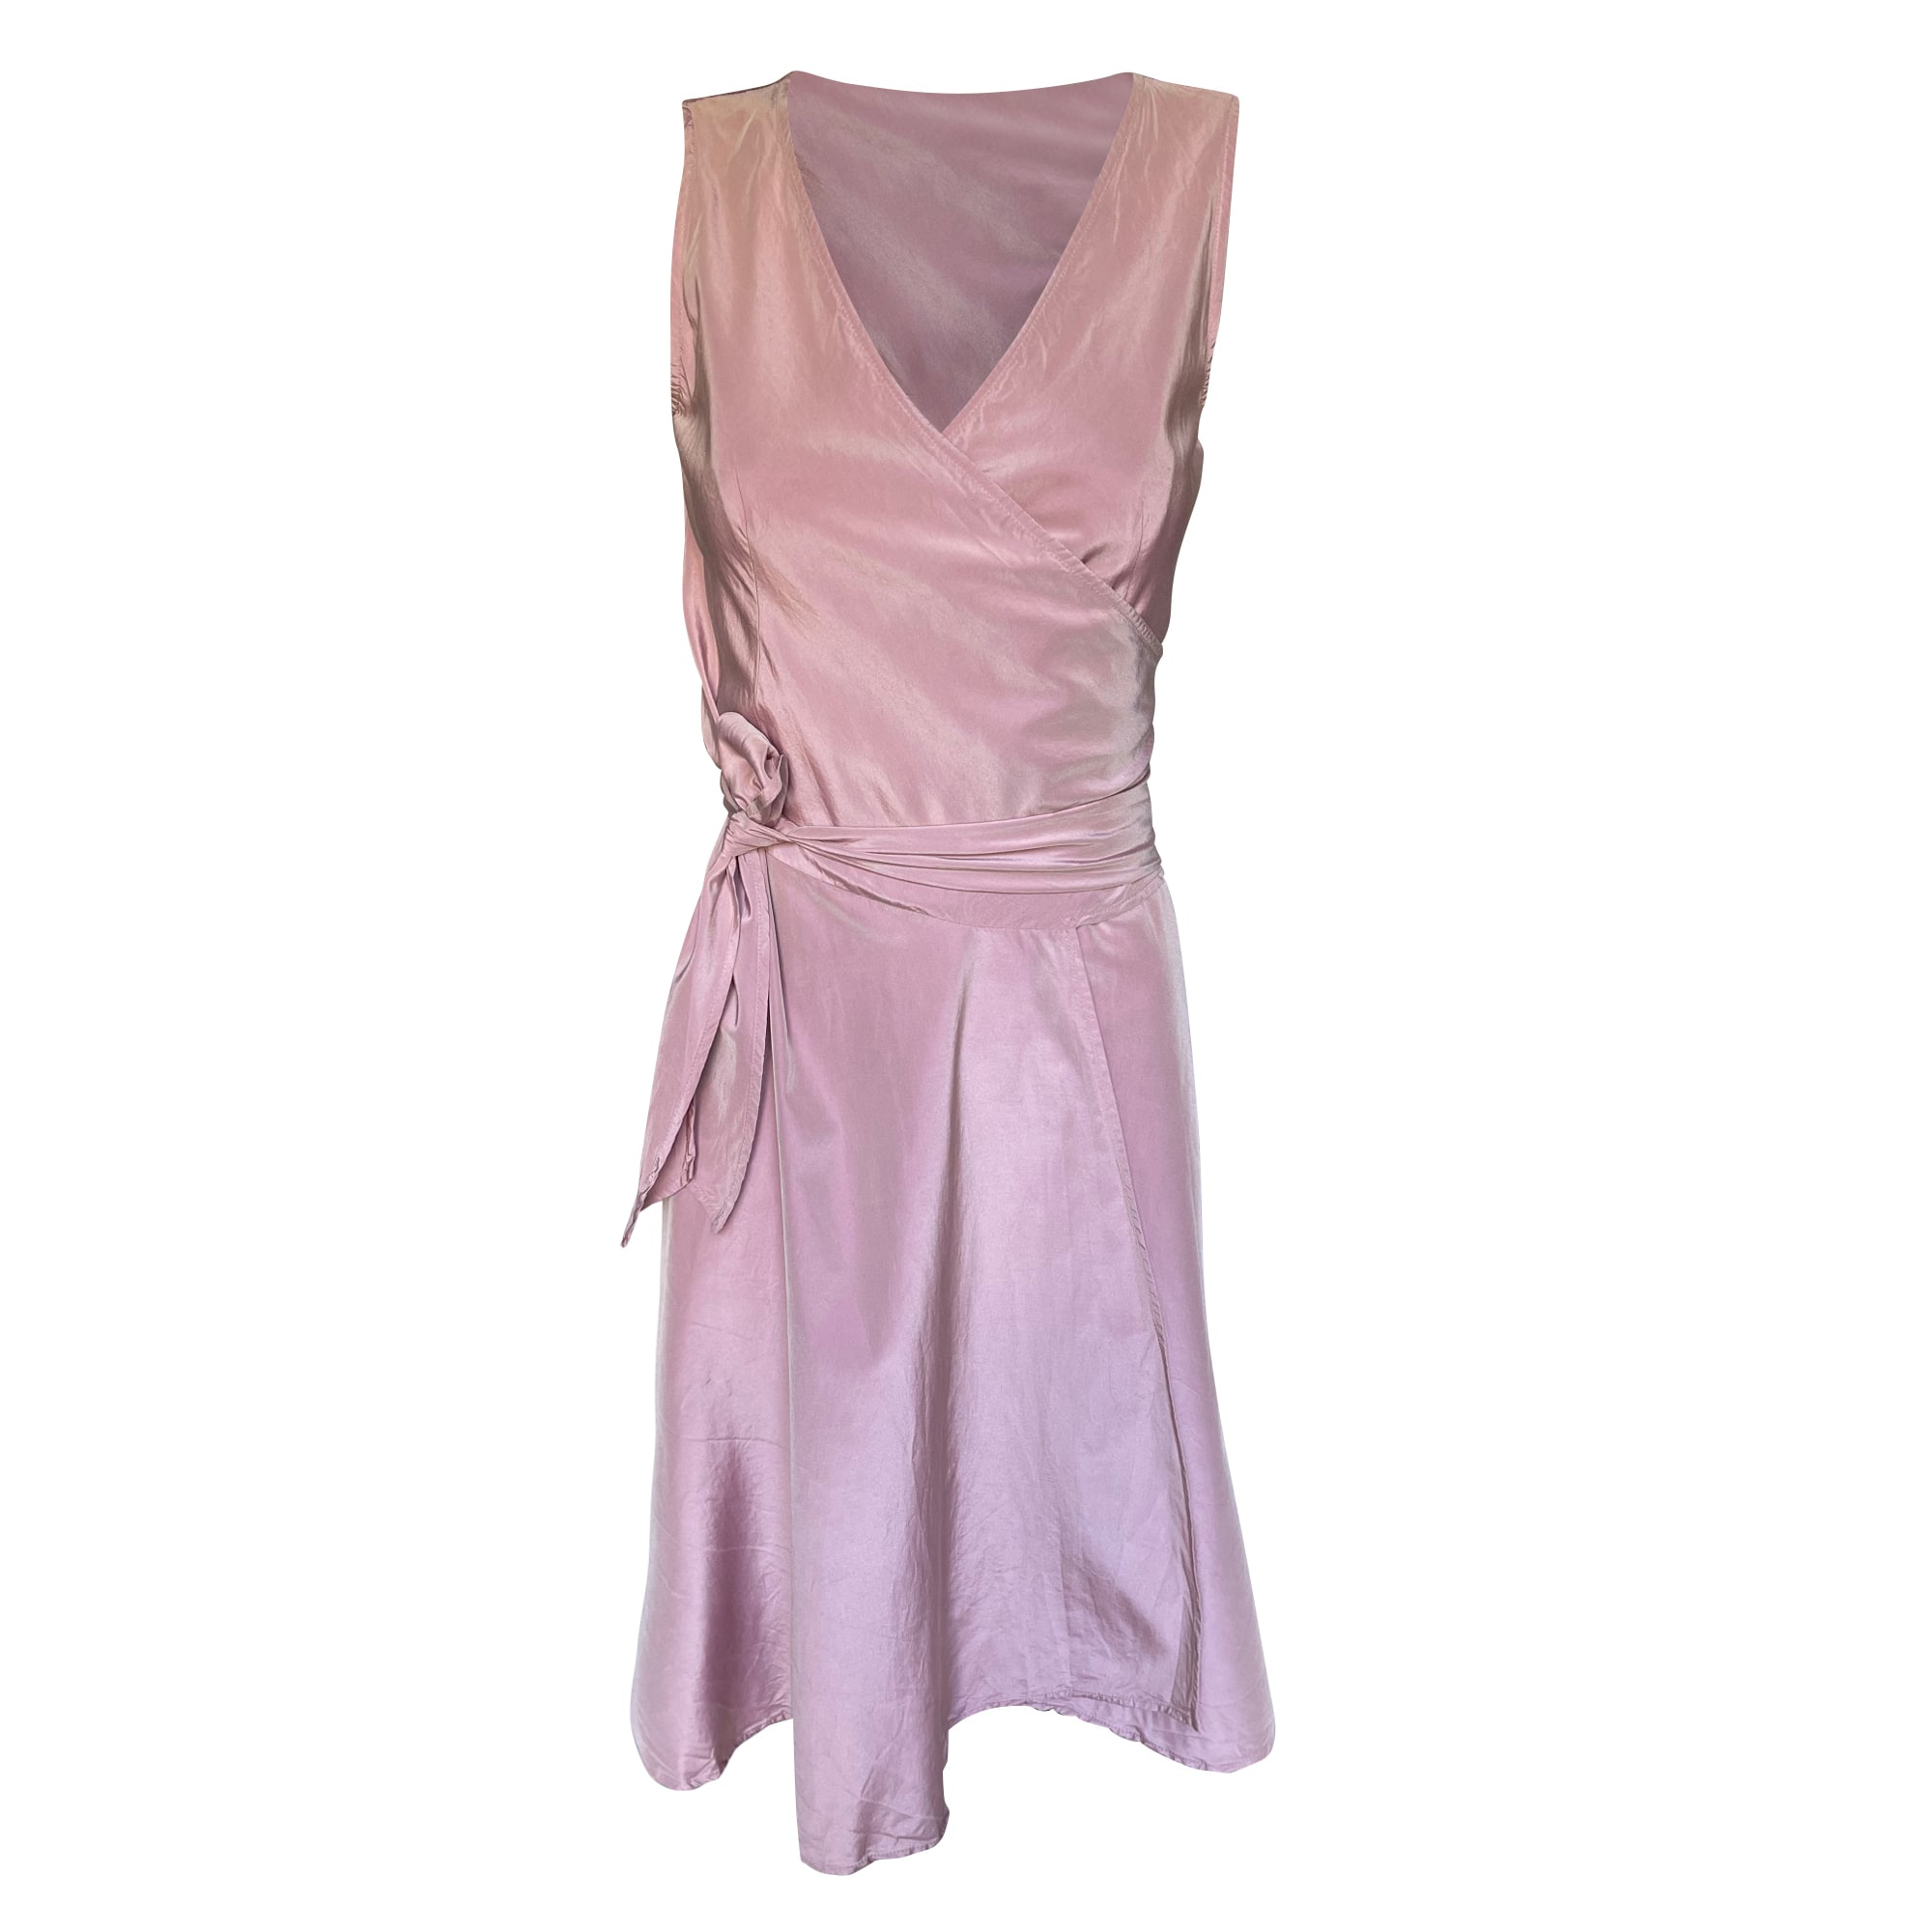 Robe courte MAX MARA Rose, fuschia, vieux rose